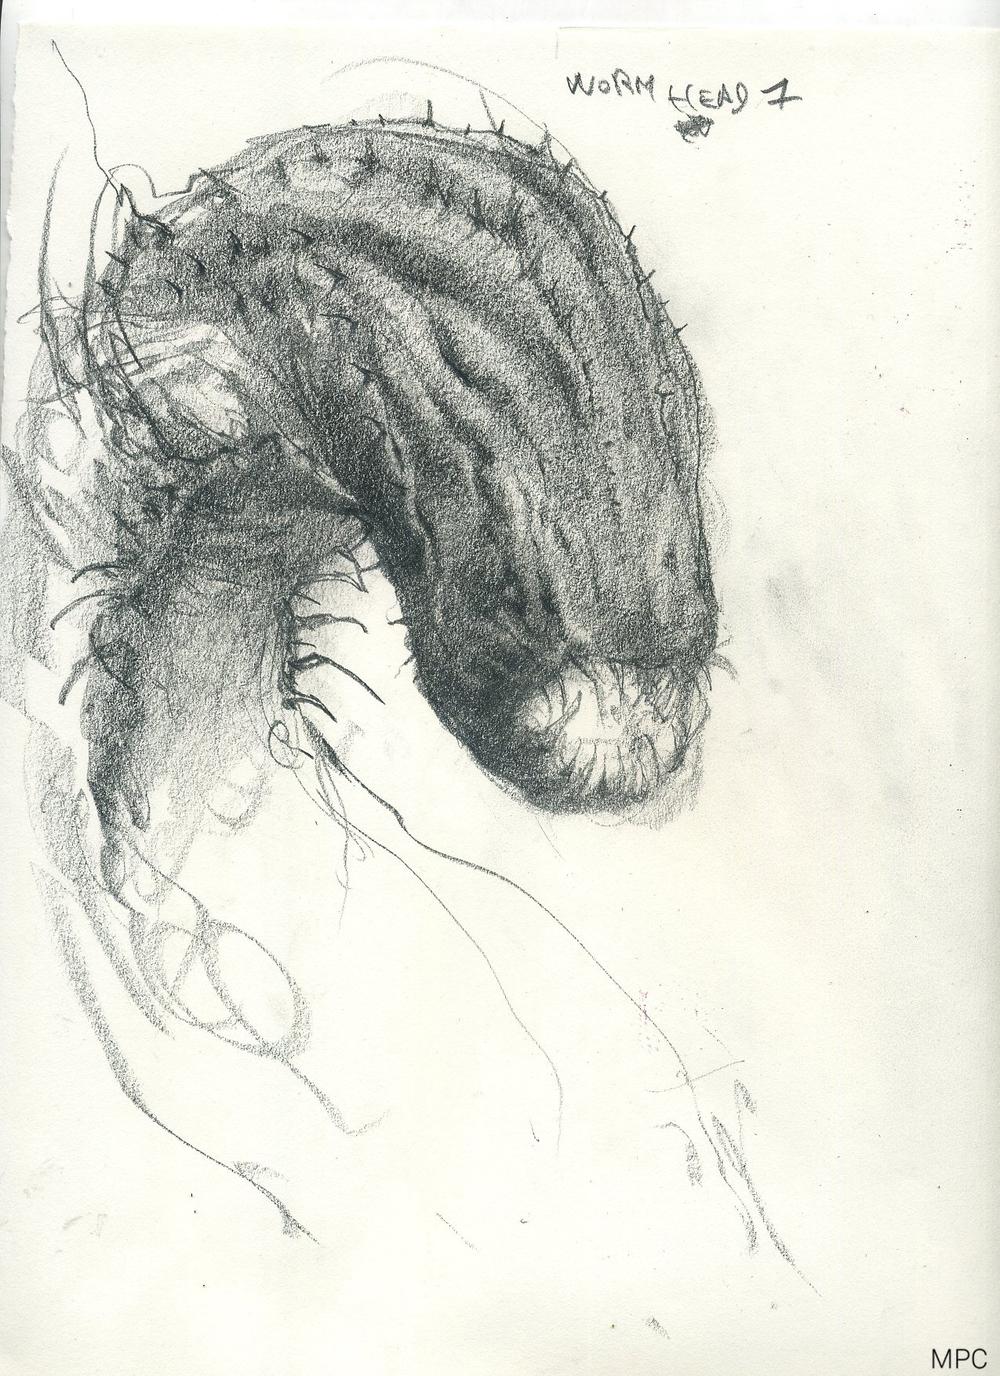 serpentwormhead1.jpg